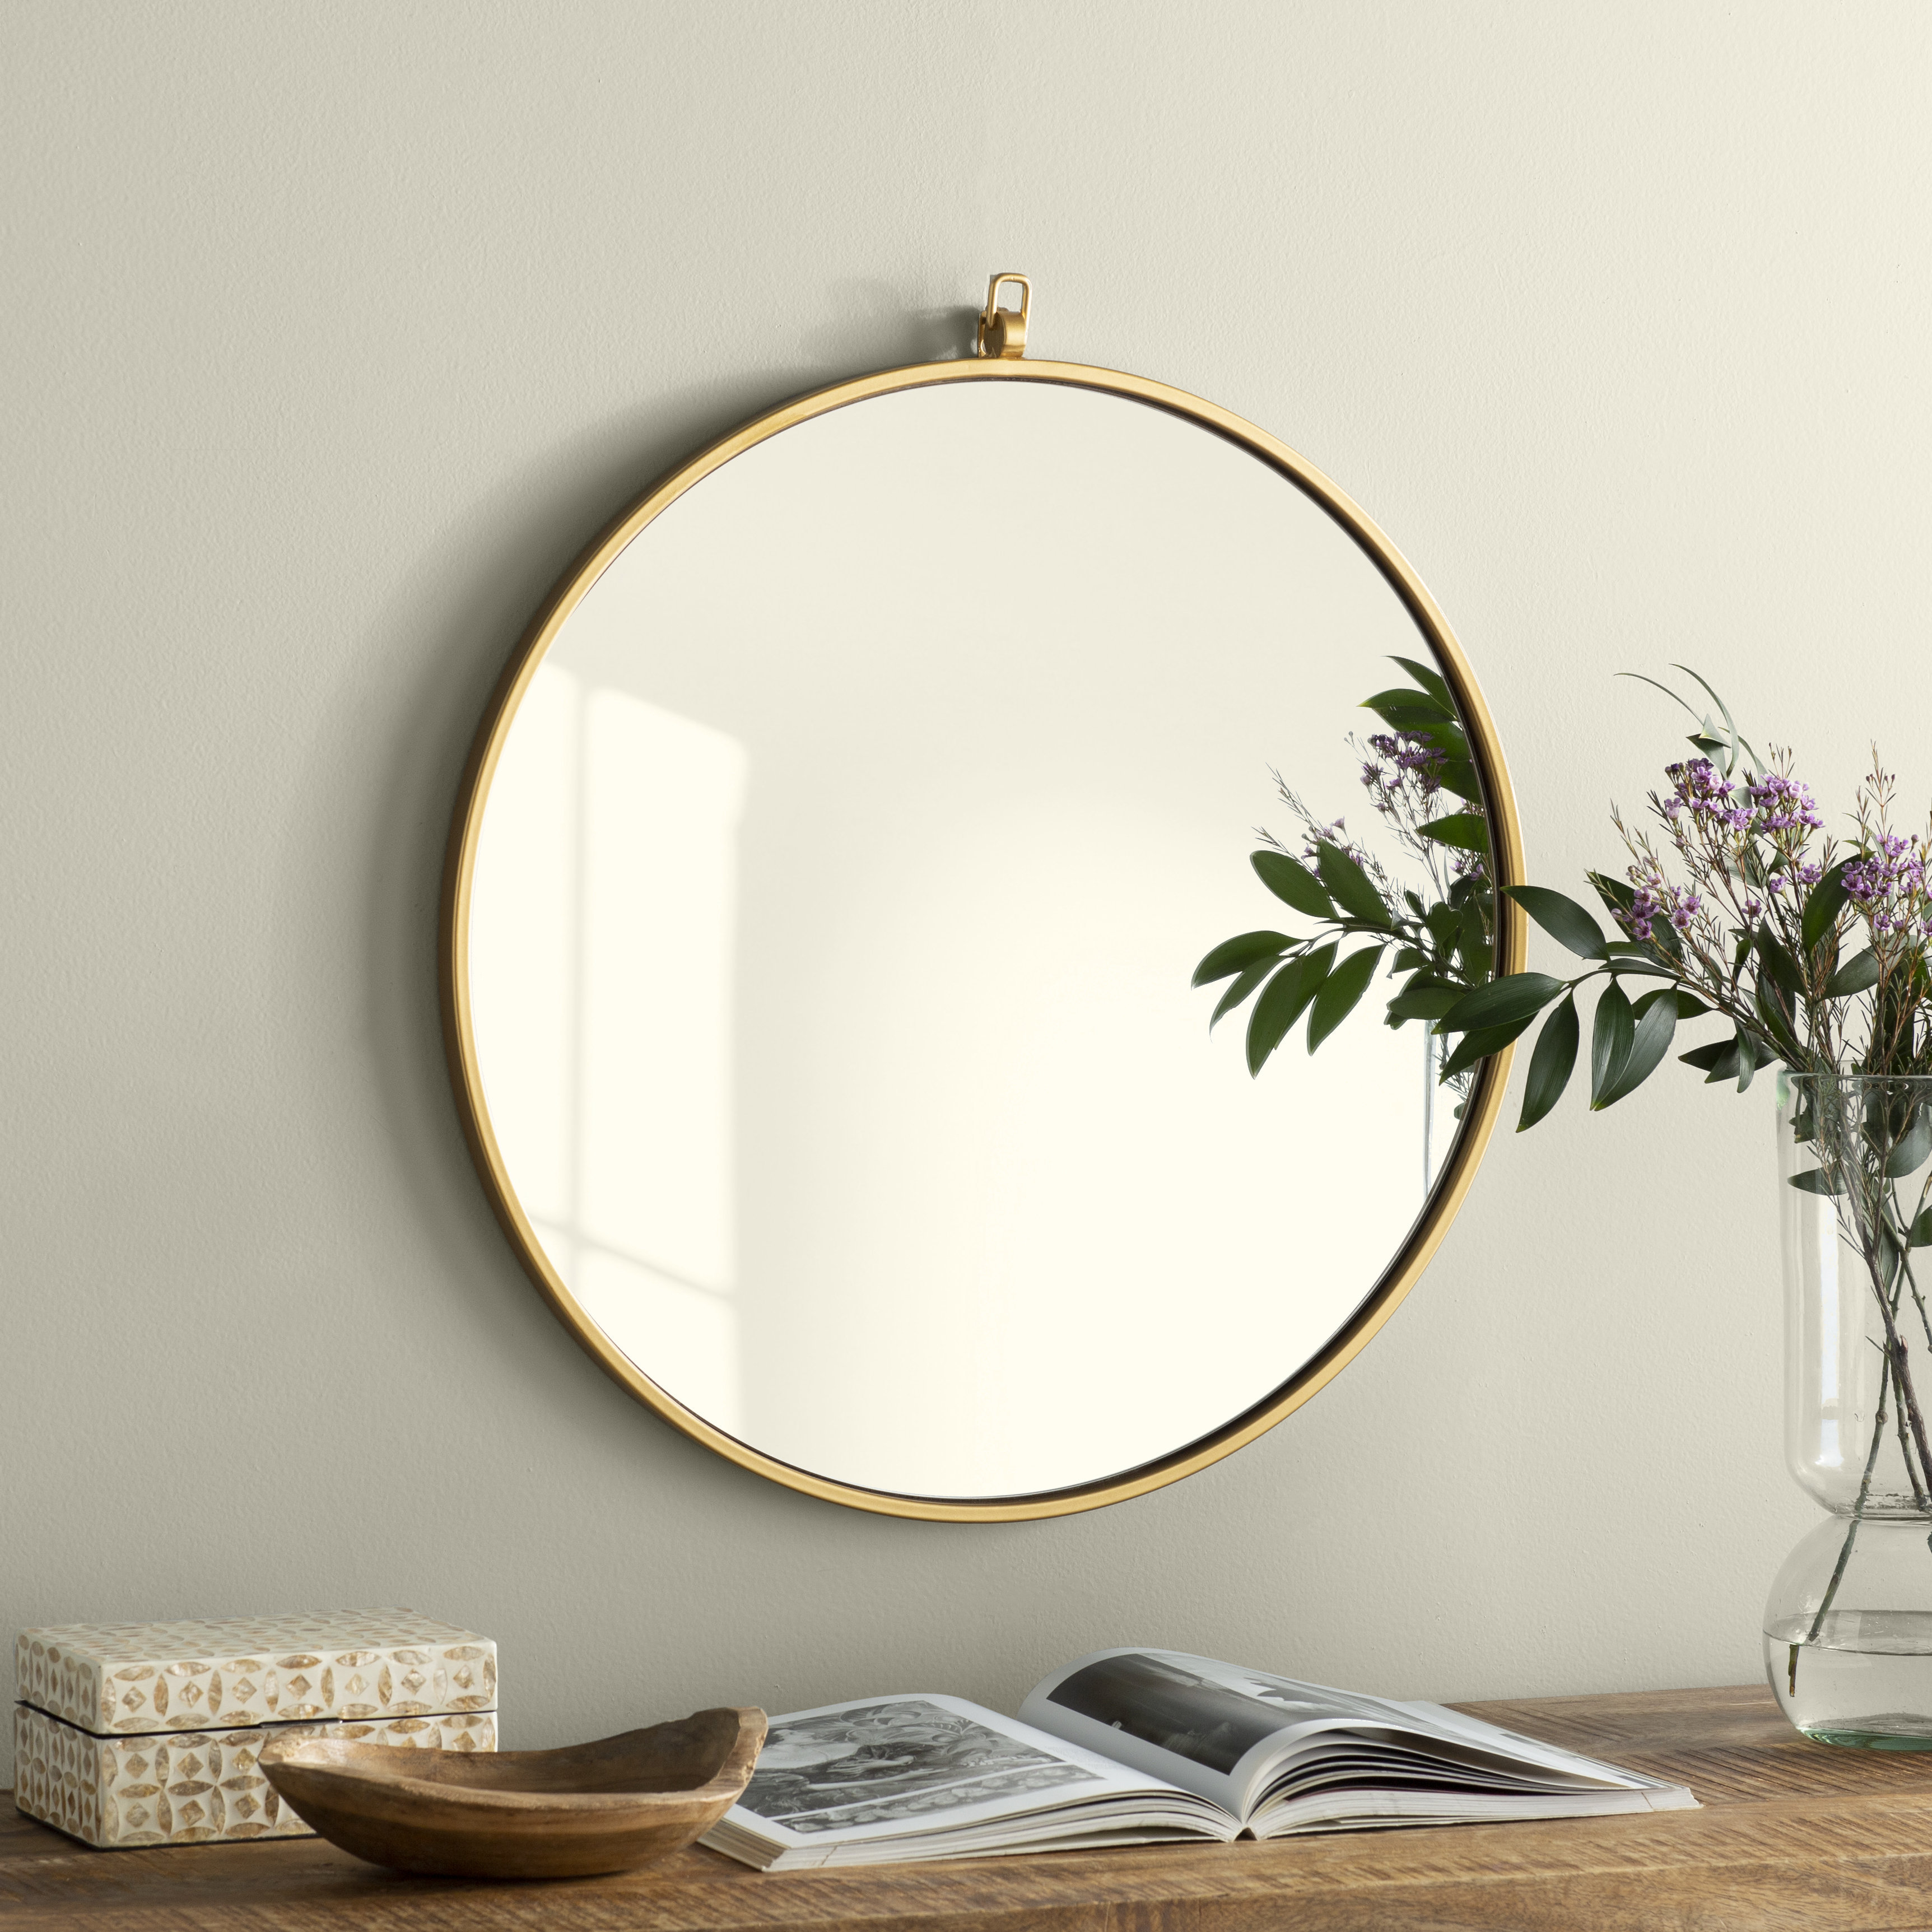 Joss & Main Essentials Accent Mirror With Rhein Accent Mirrors (Image 8 of 20)